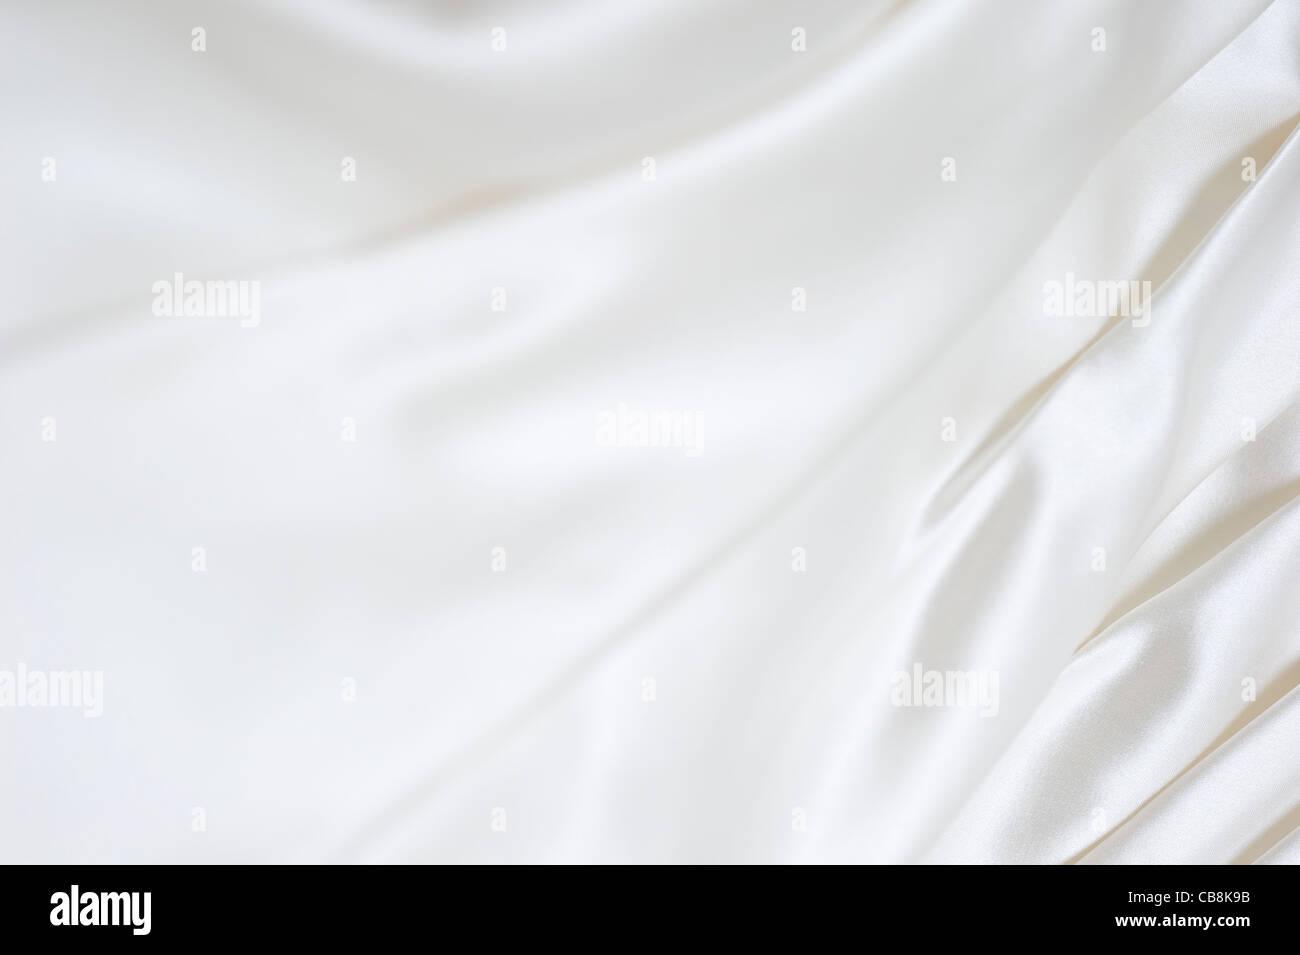 Wedding dress details - Stock Image